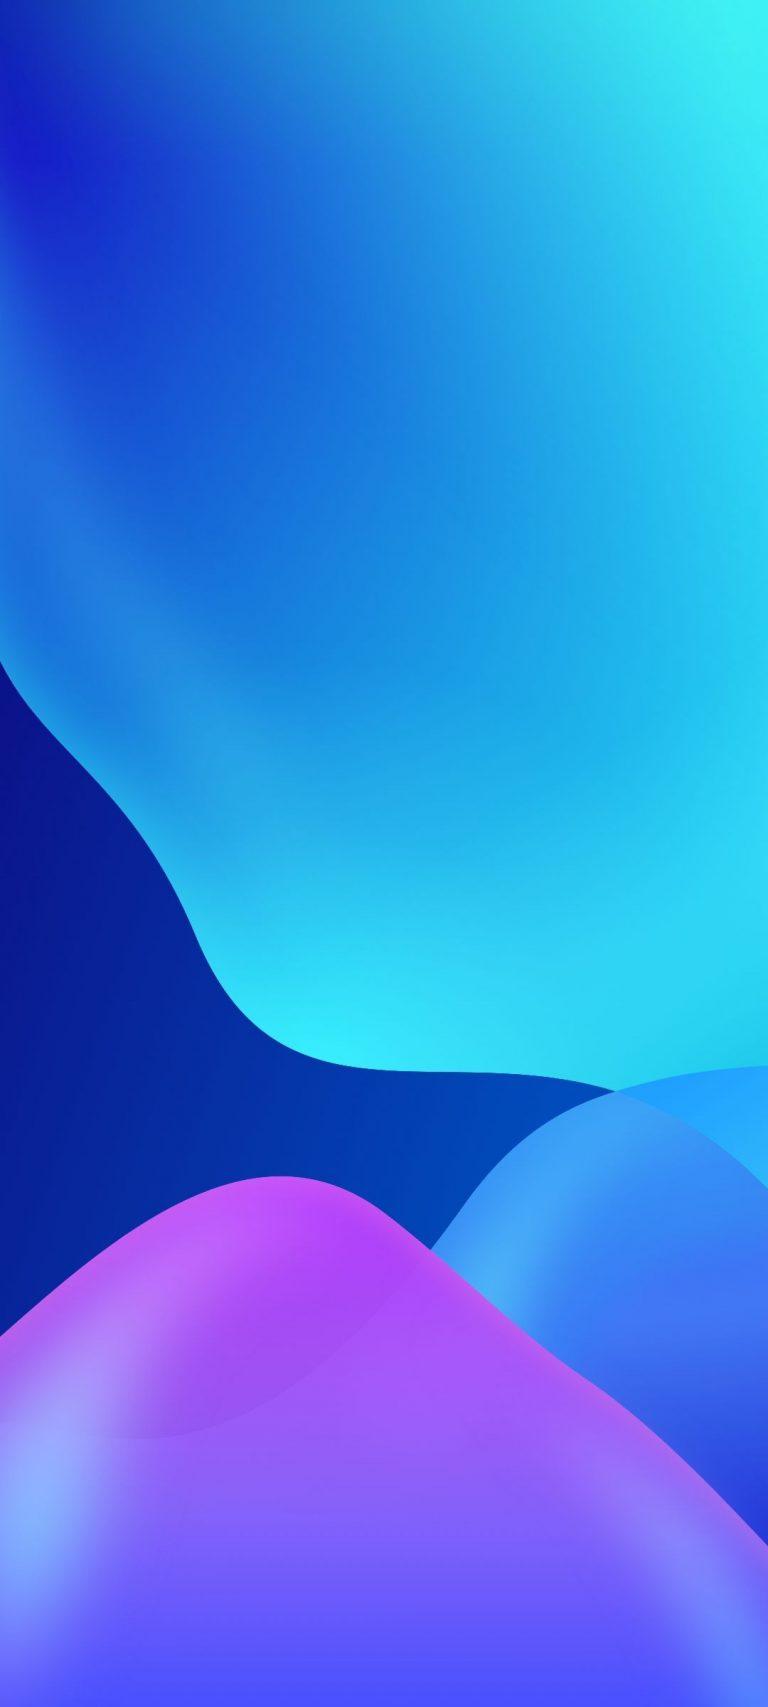 Realme UI 2.0 Stock Wallpaper [1080x2400] - 06